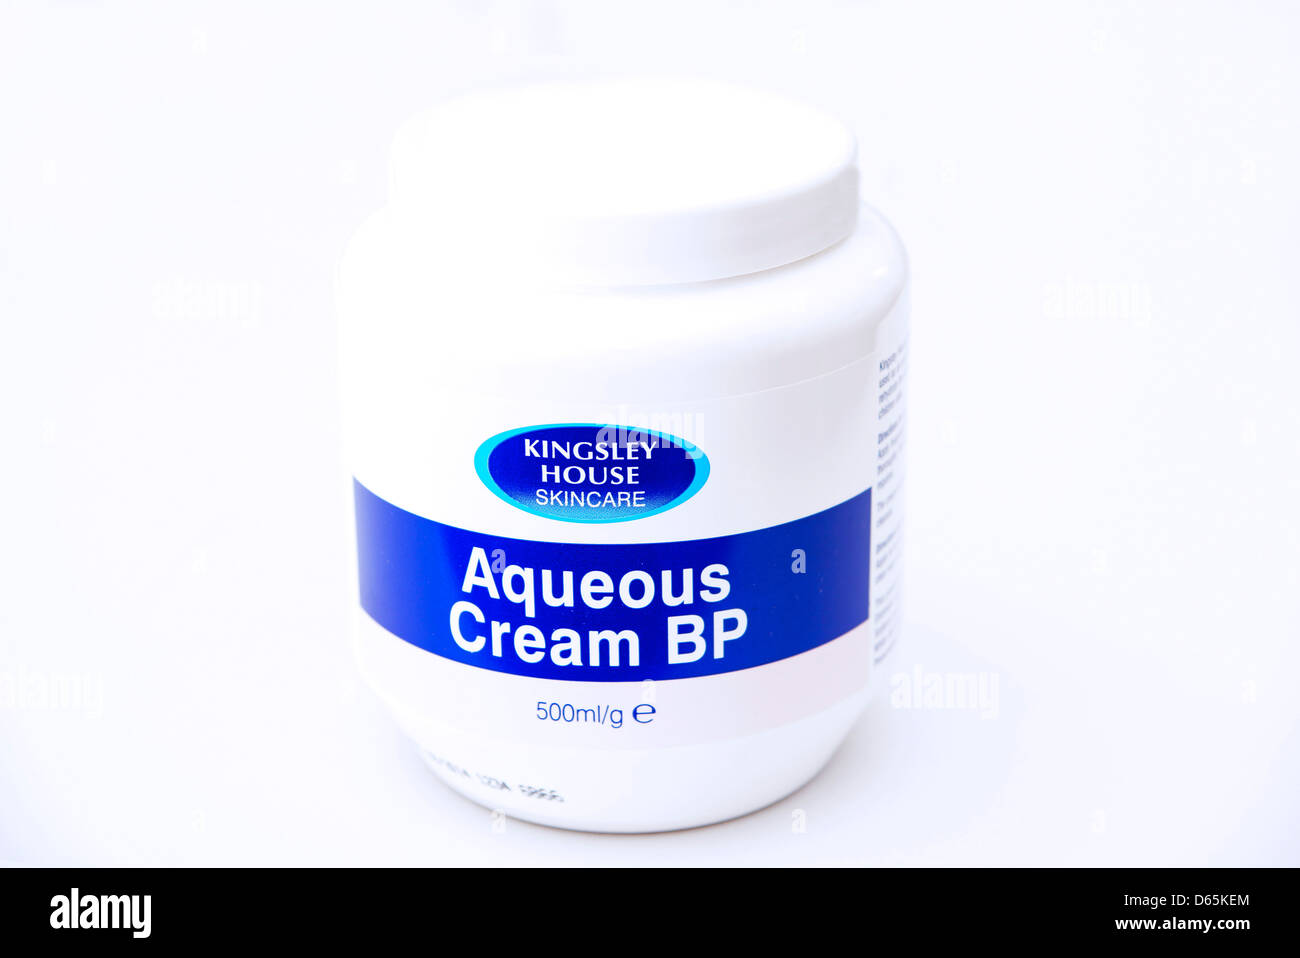 Aqueous; cream; highly; moisturising; moisturiser; moisturises; protective; hydrating; hydrates; protects; treatment; - Stock Image